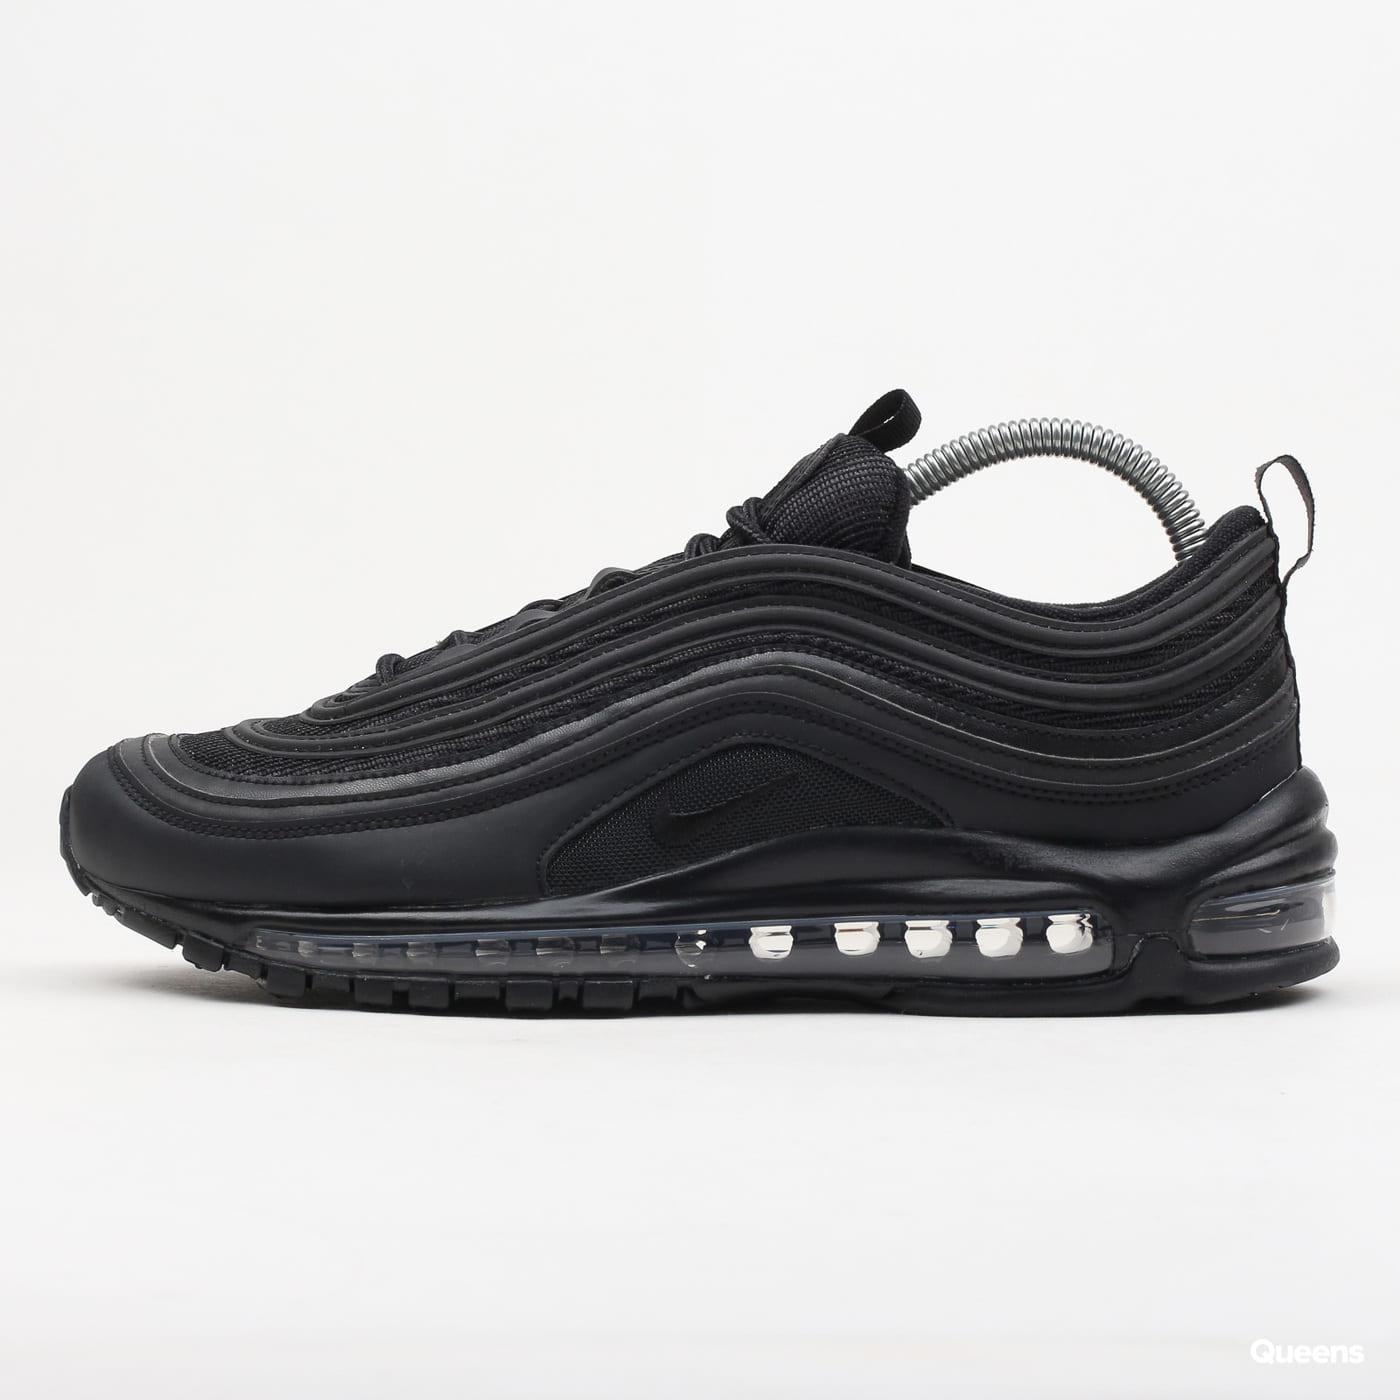 Nike Air Max 97 black / black - white